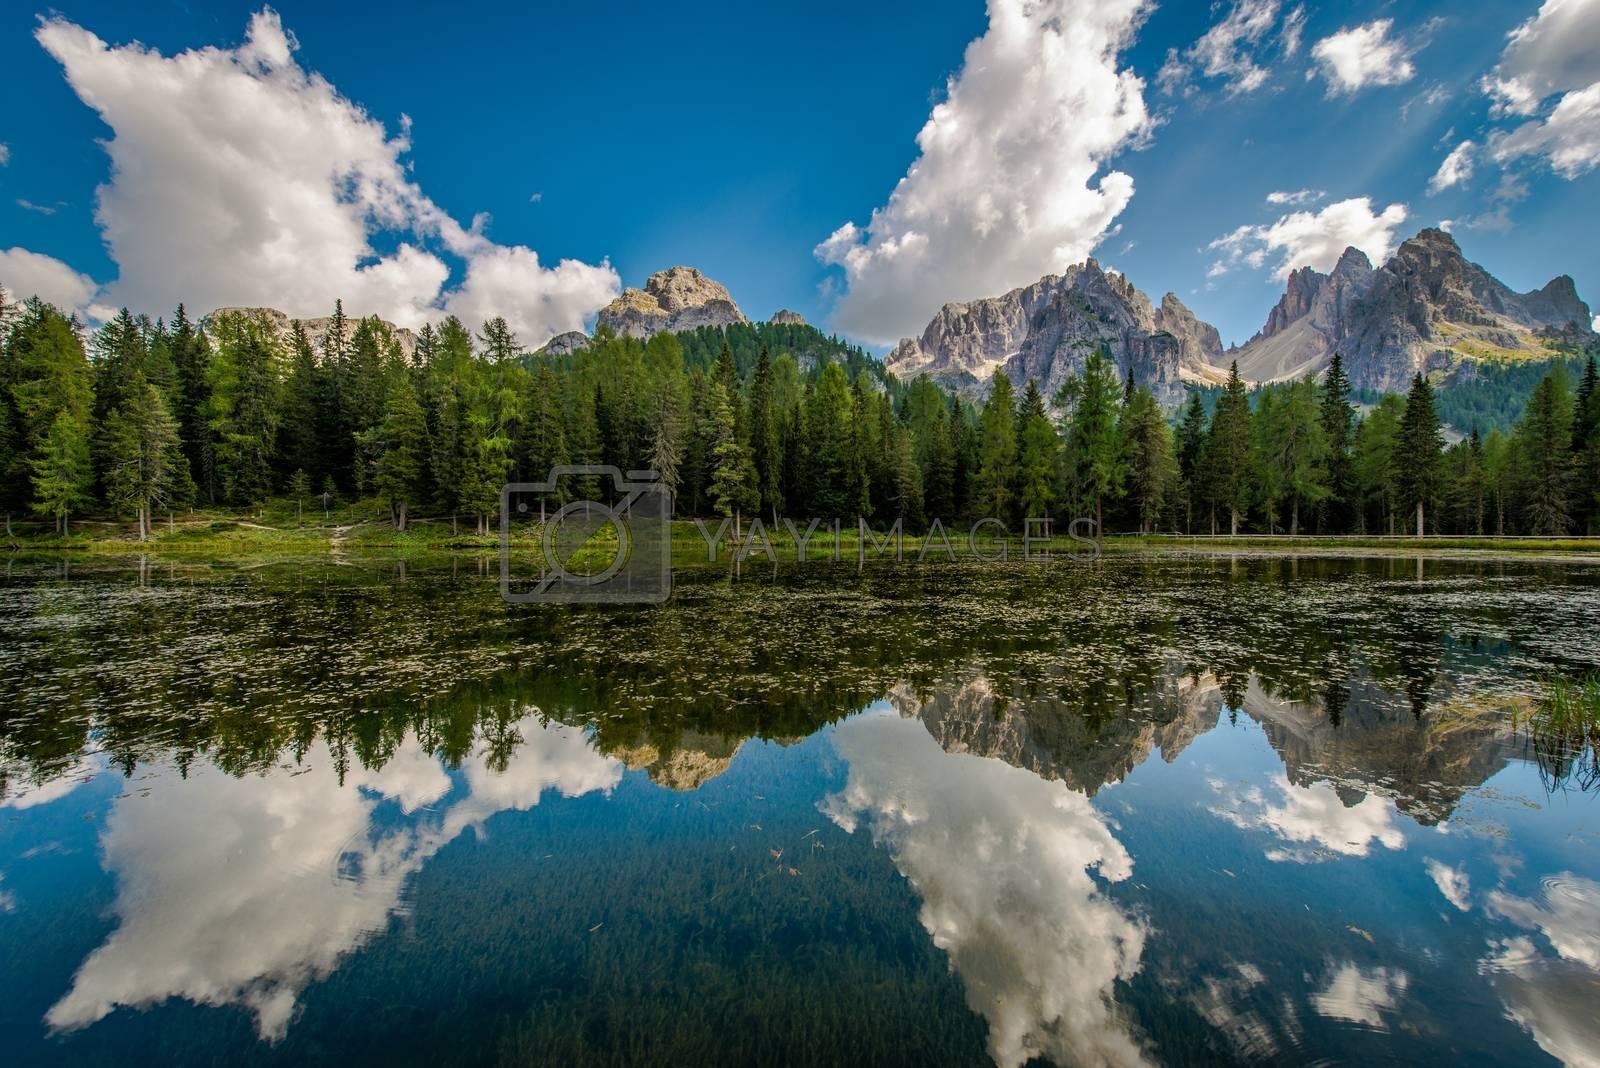 Dolomites Mountain Landscape. Beautiful Summer Scenery in Italian Dolomites. Lake Misurina Reflections.